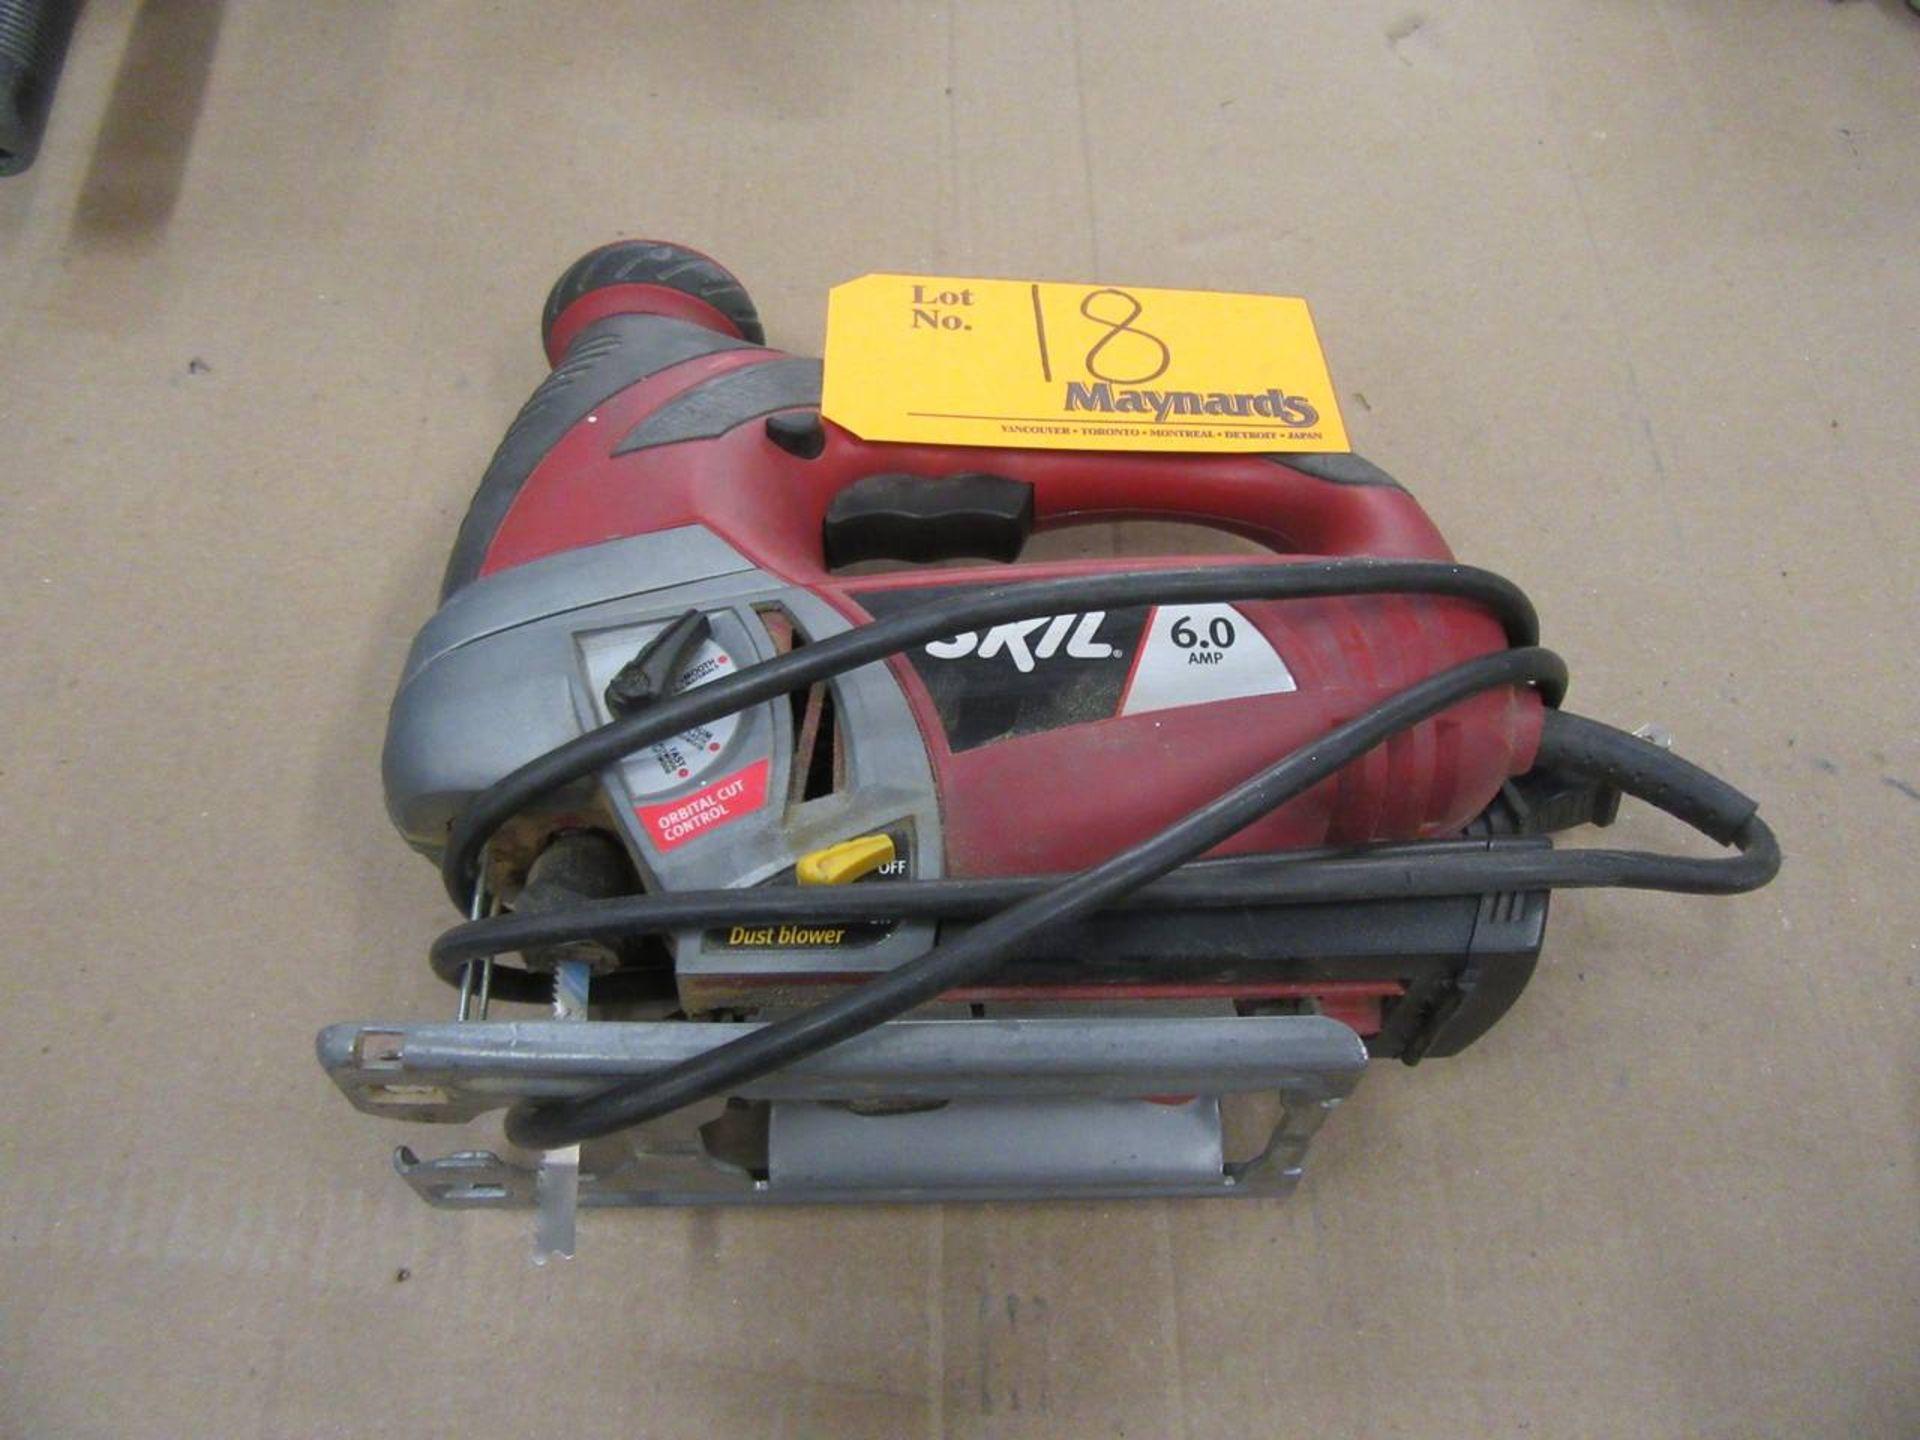 Skil 4690 Jigsaw - Image 2 of 2